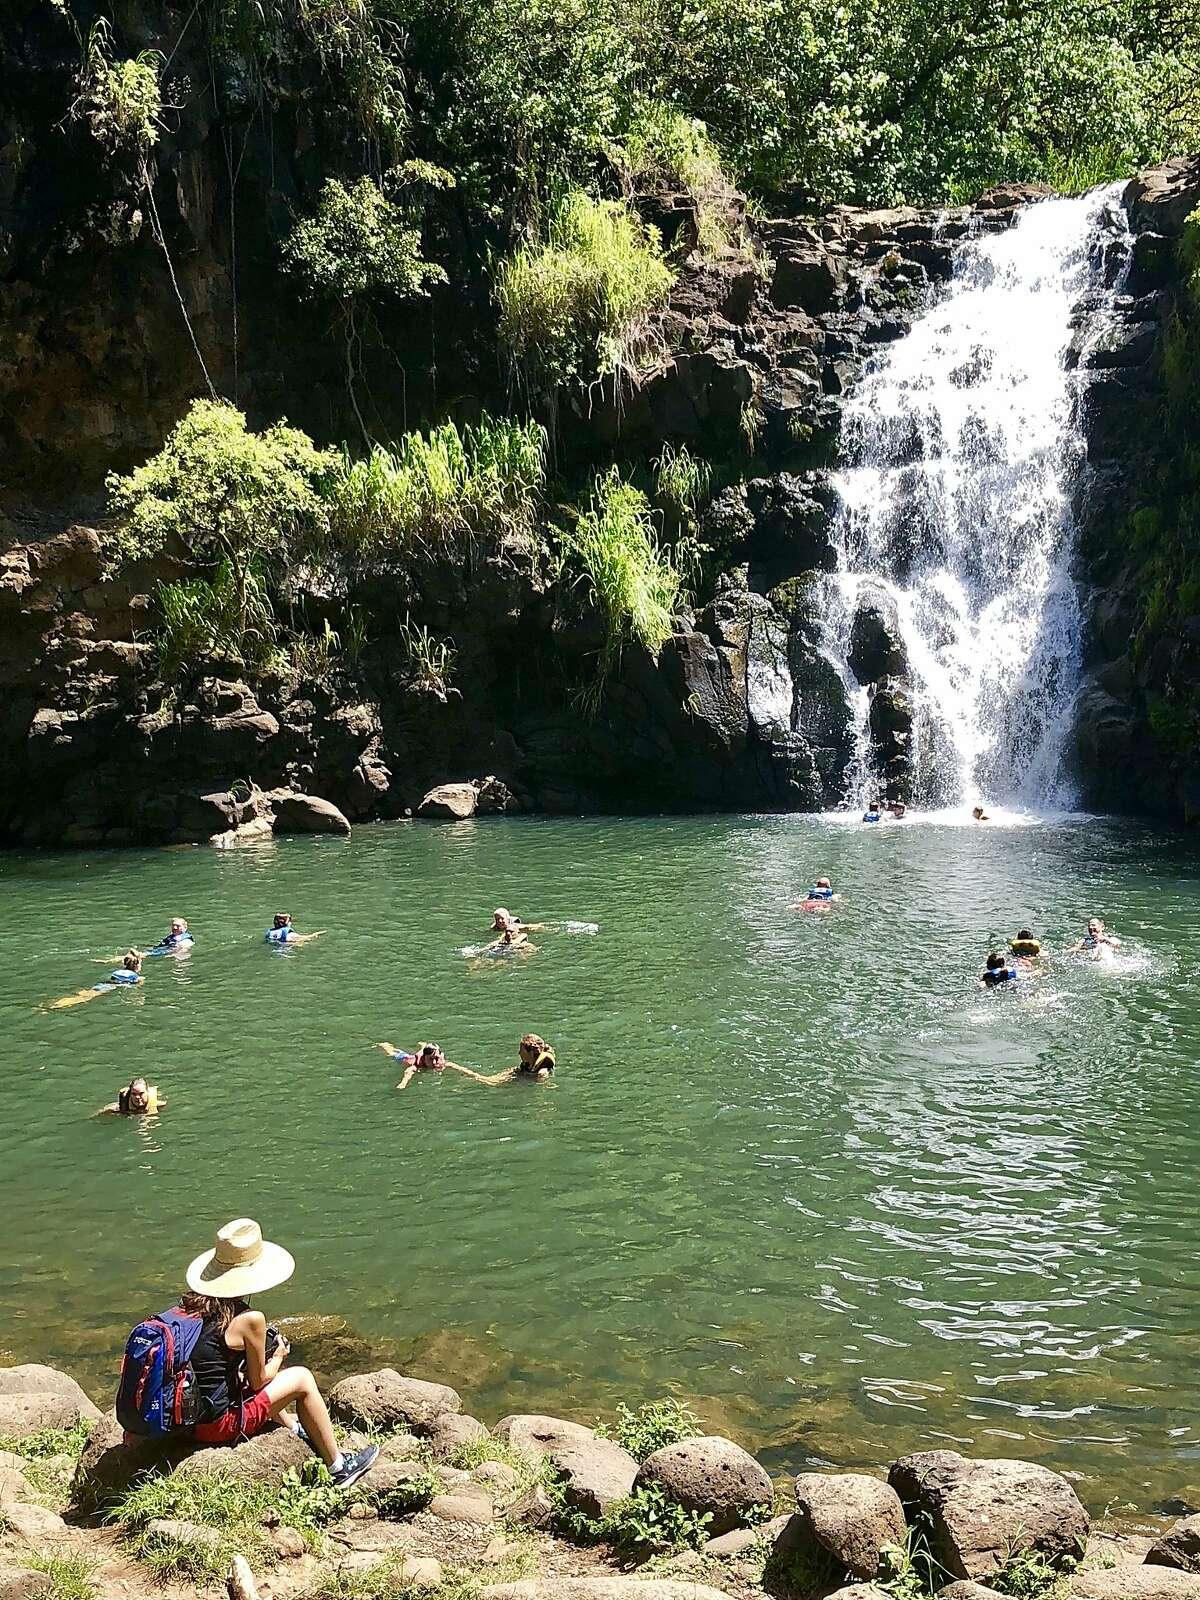 A waterfall awaits those who visit the Waimea Valley, home to the Kahuna Nui (high priests) from 1092 AD.